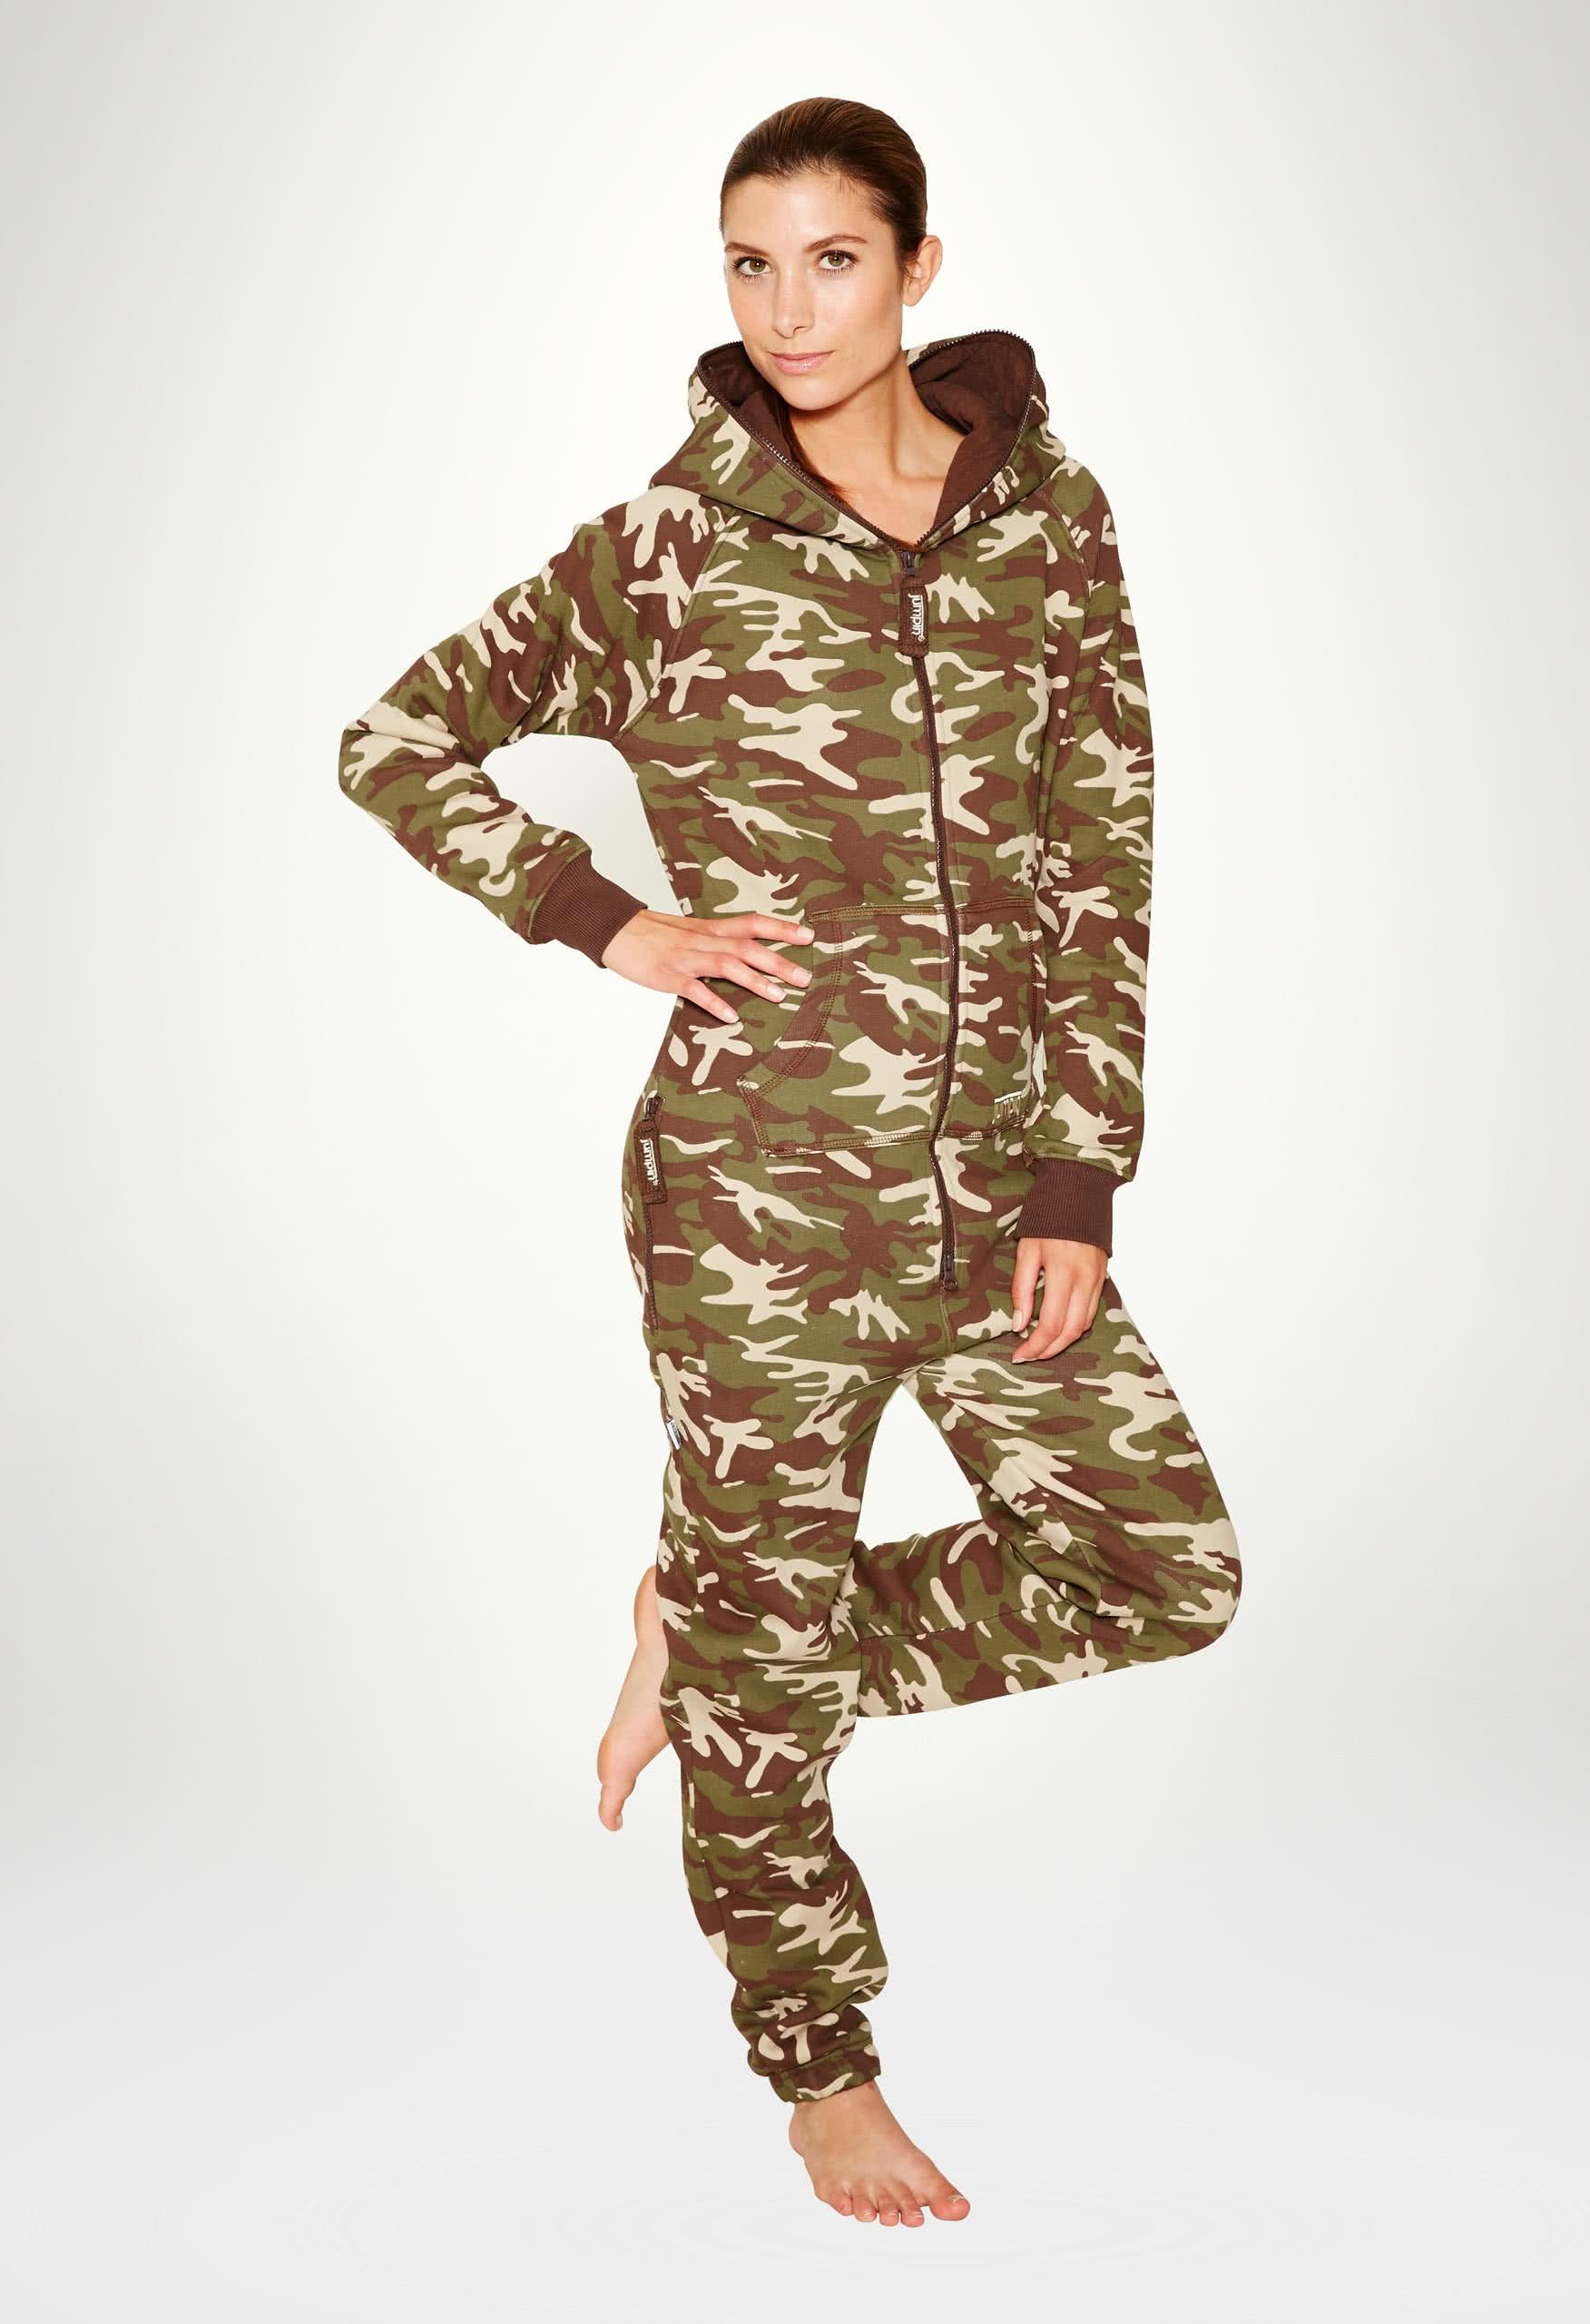 Jumpsuit Original Camouflage - Damen